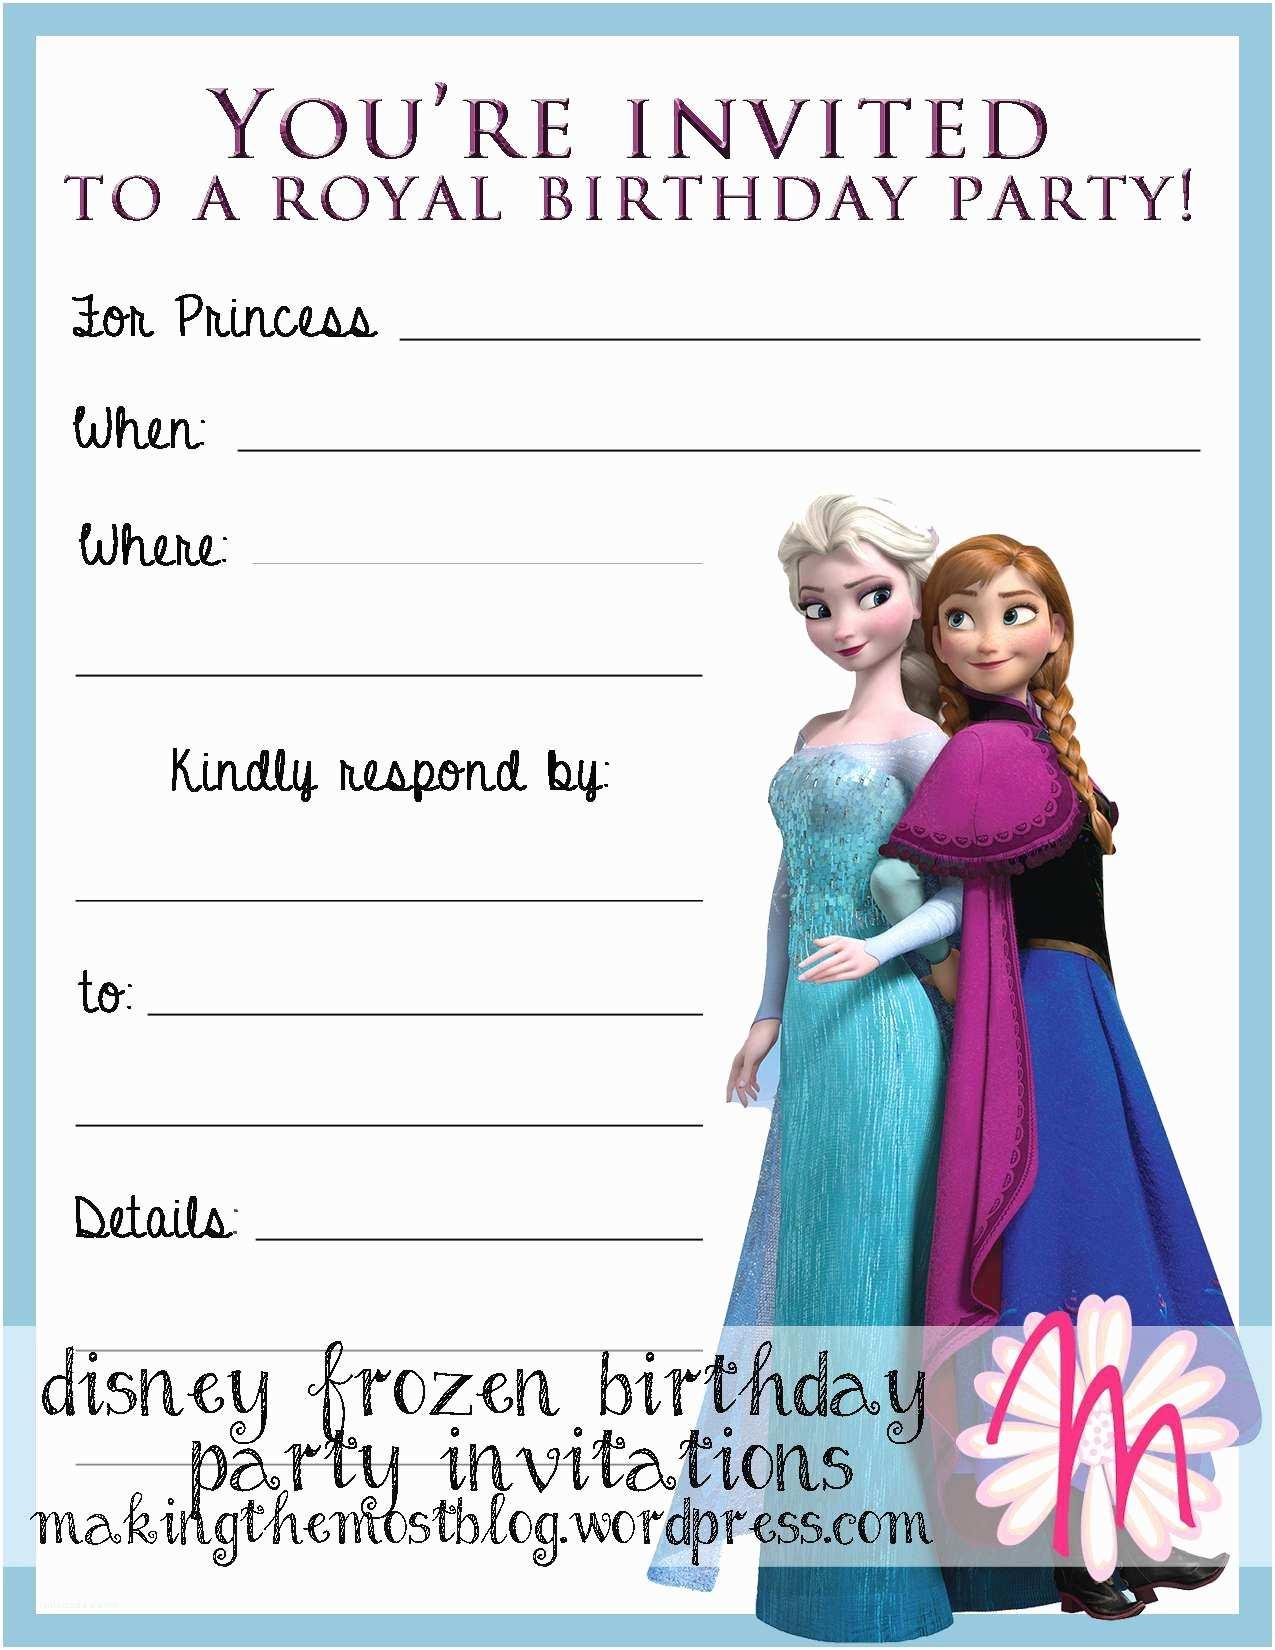 Walgreens Birthday Invitations Unique Ideas for Walgreens Party Invitations Prepossessing